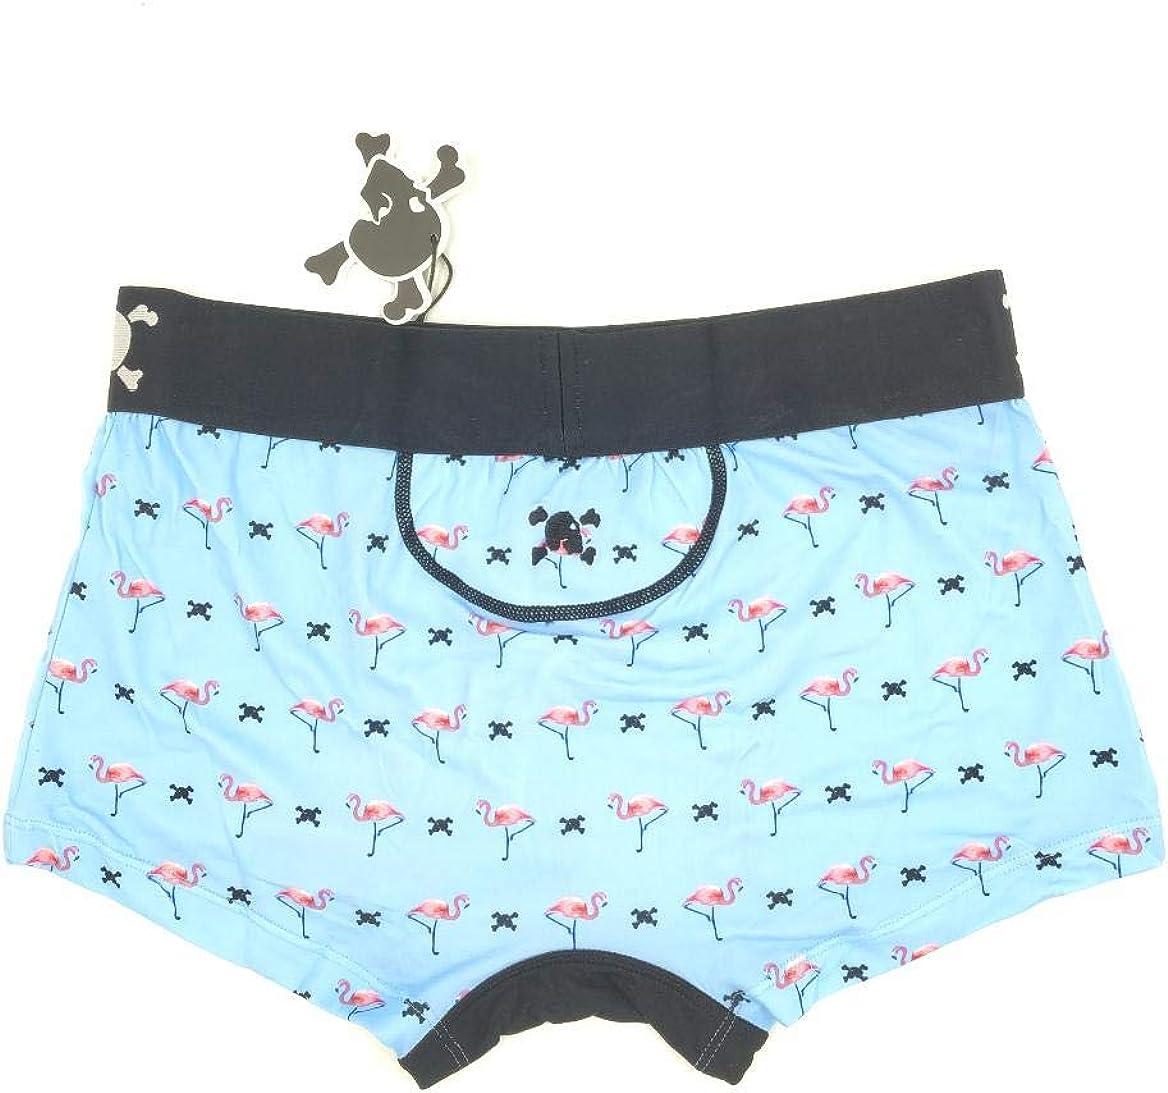 Skull and Bones Classic Fashion Trunk Underwear Blue Flamingo Print SB02